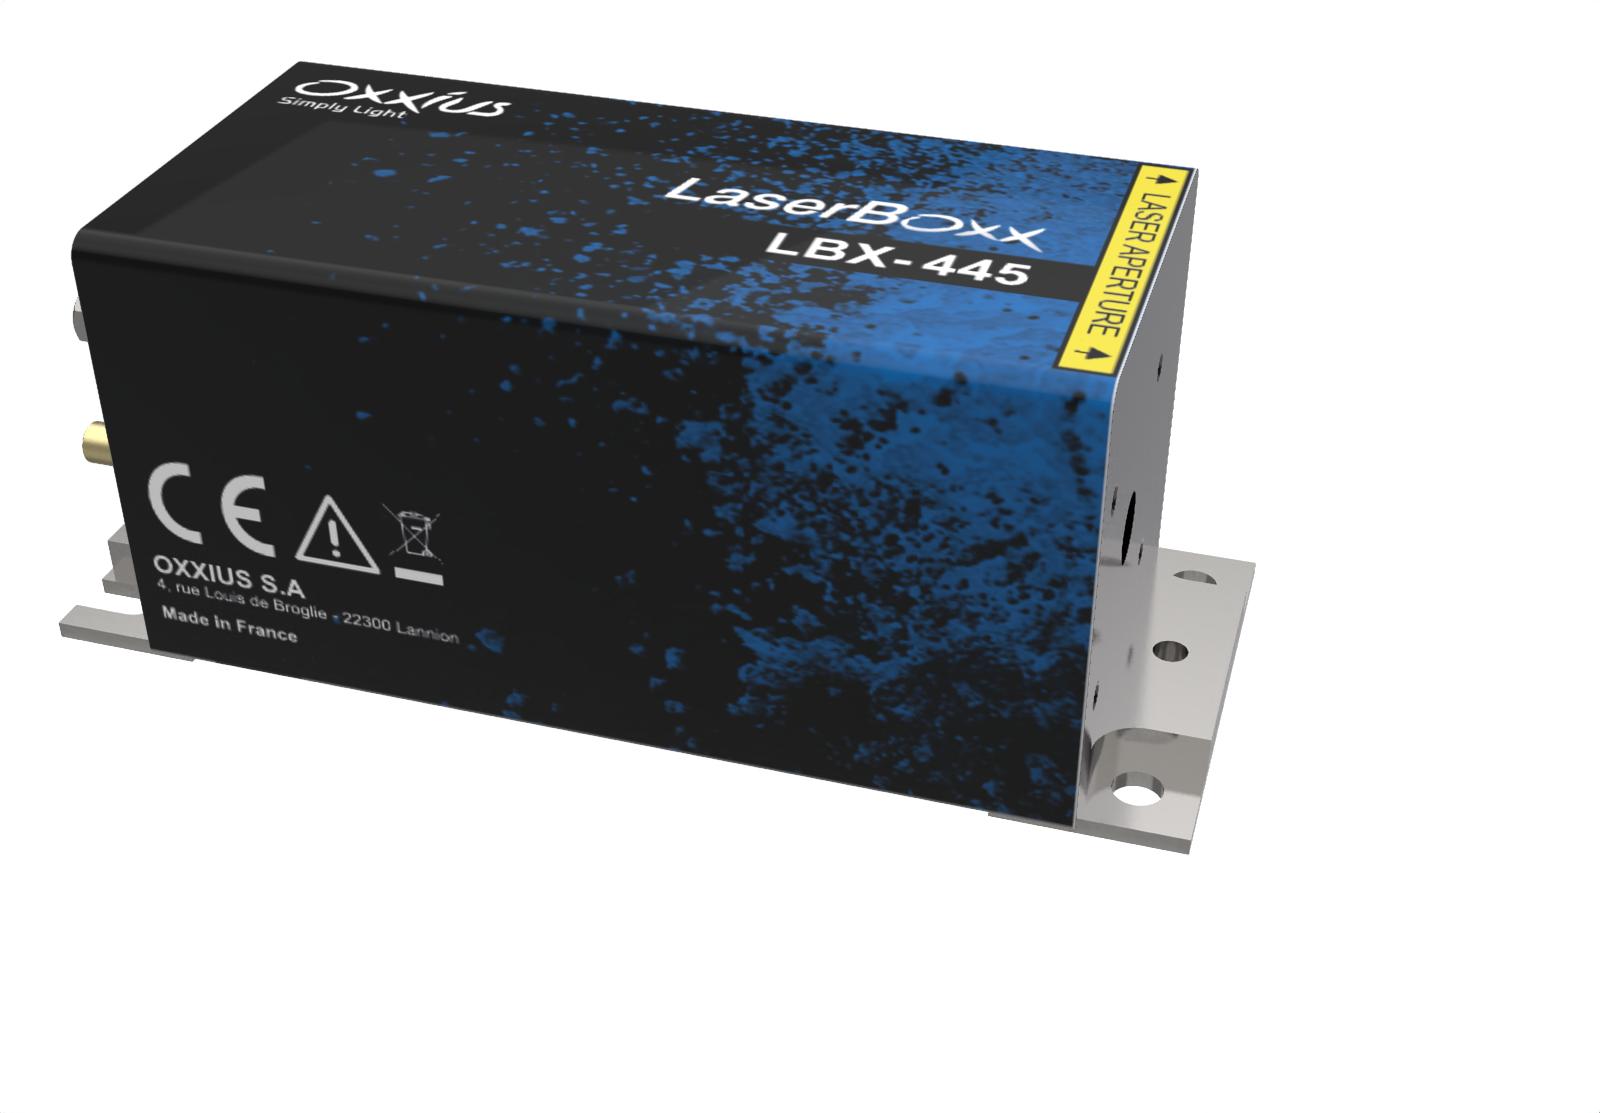 LBX-445-70-CSB